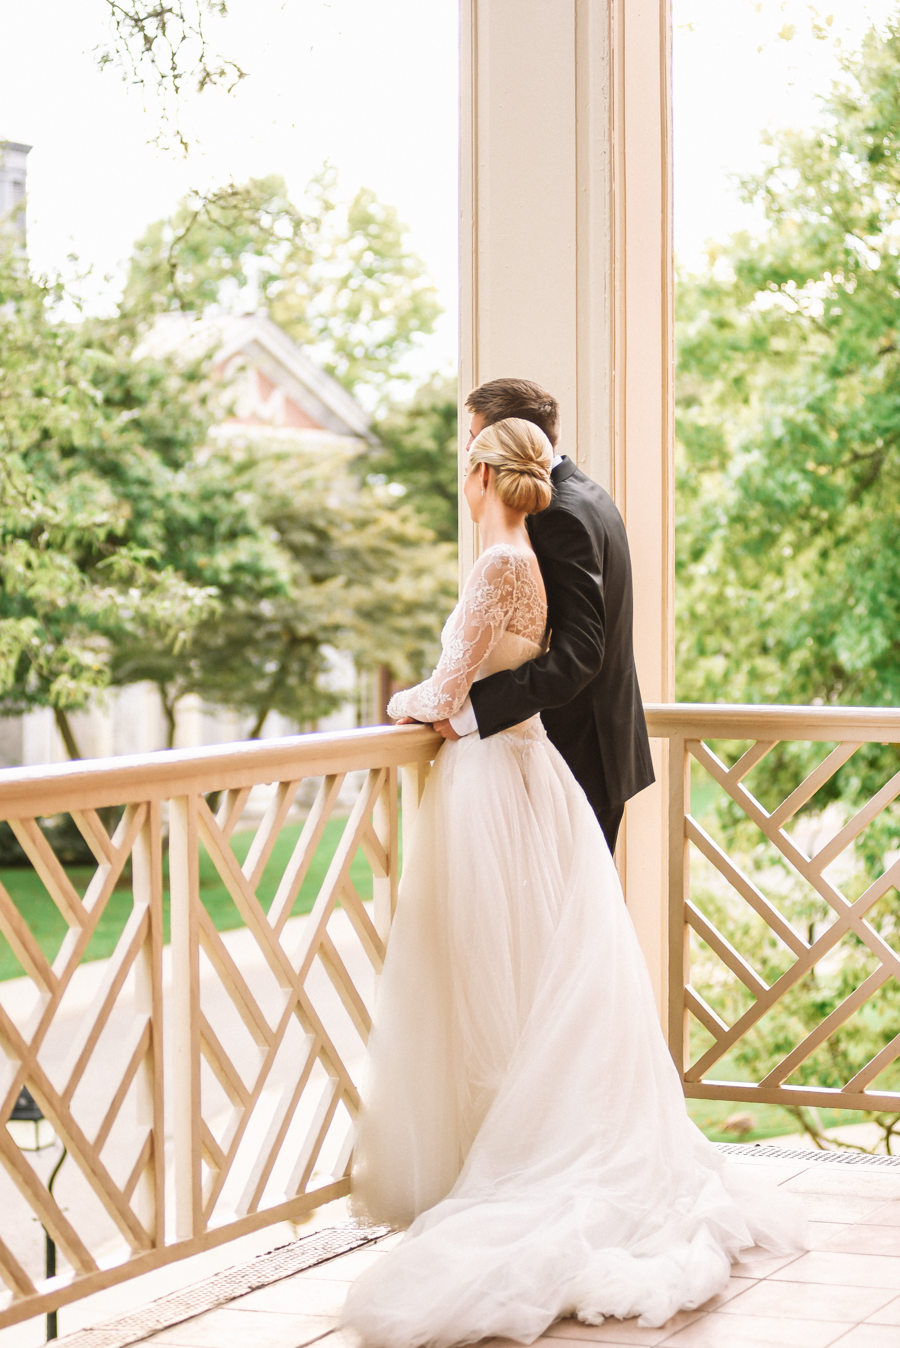 Henry_Ford__Lovett_Hall_Wedding_Detroit-38.jpg